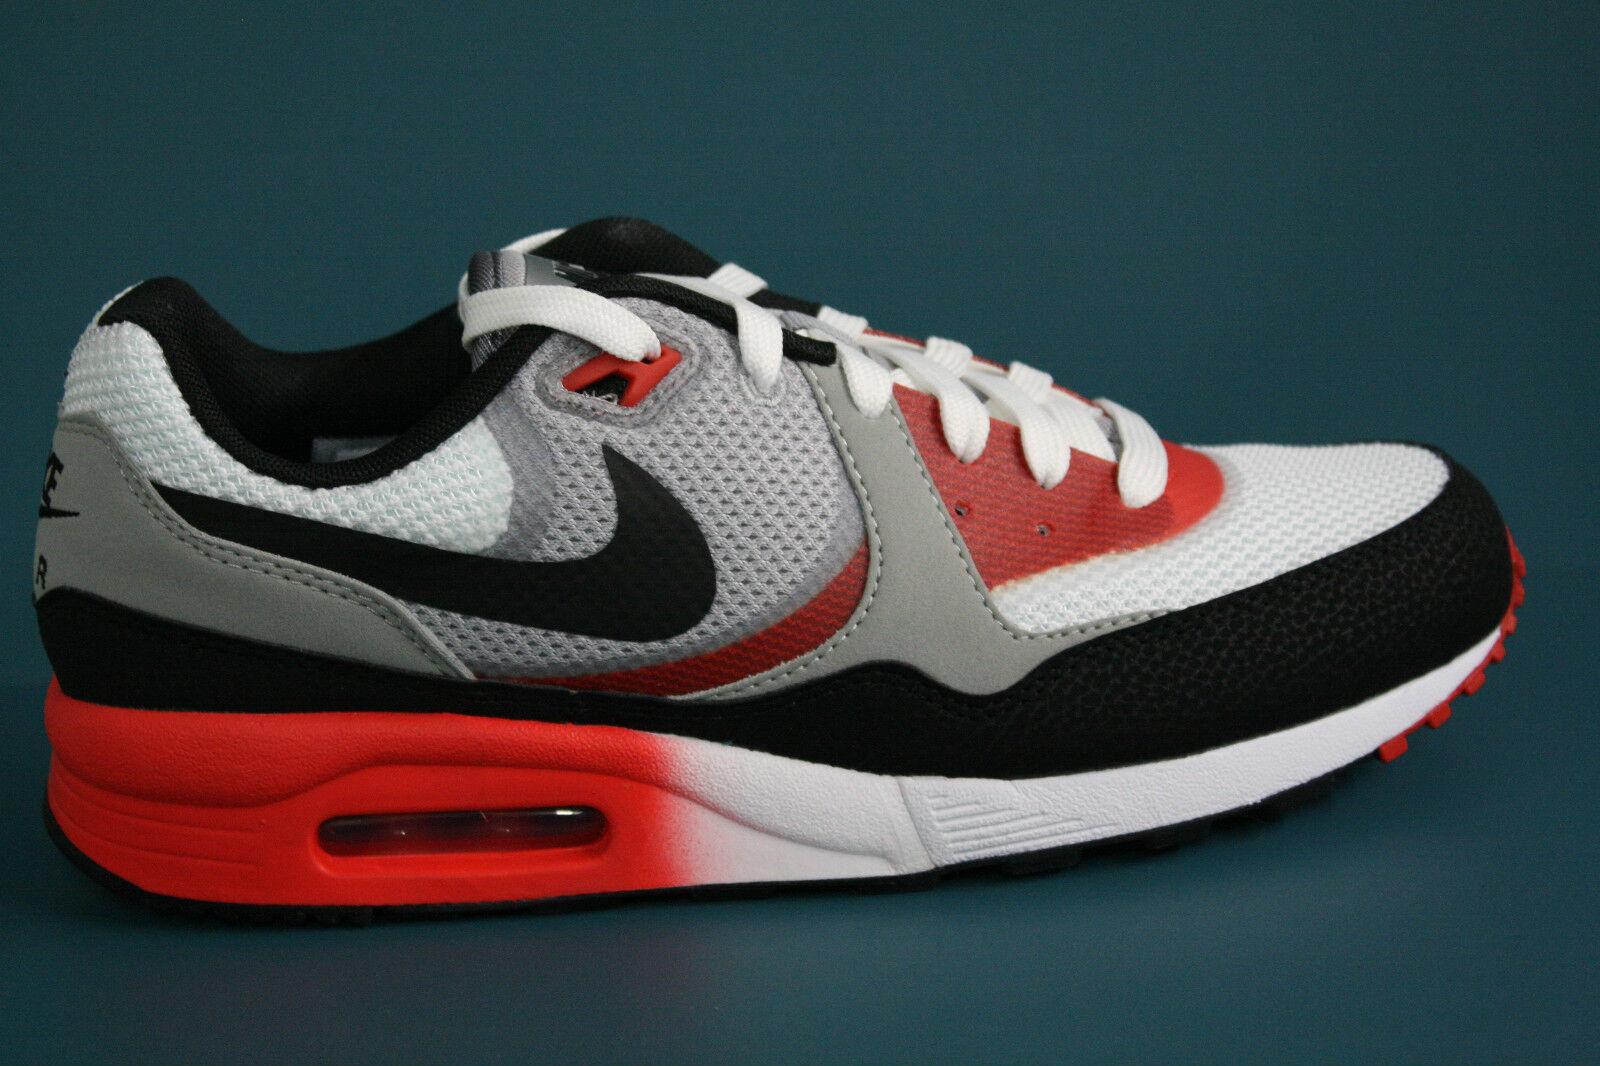 631758-006 Men's Nike AIR MAX LIGHT C1.0 COOL GREY-BLACK-CRIMSON-UNIVERSITY RED